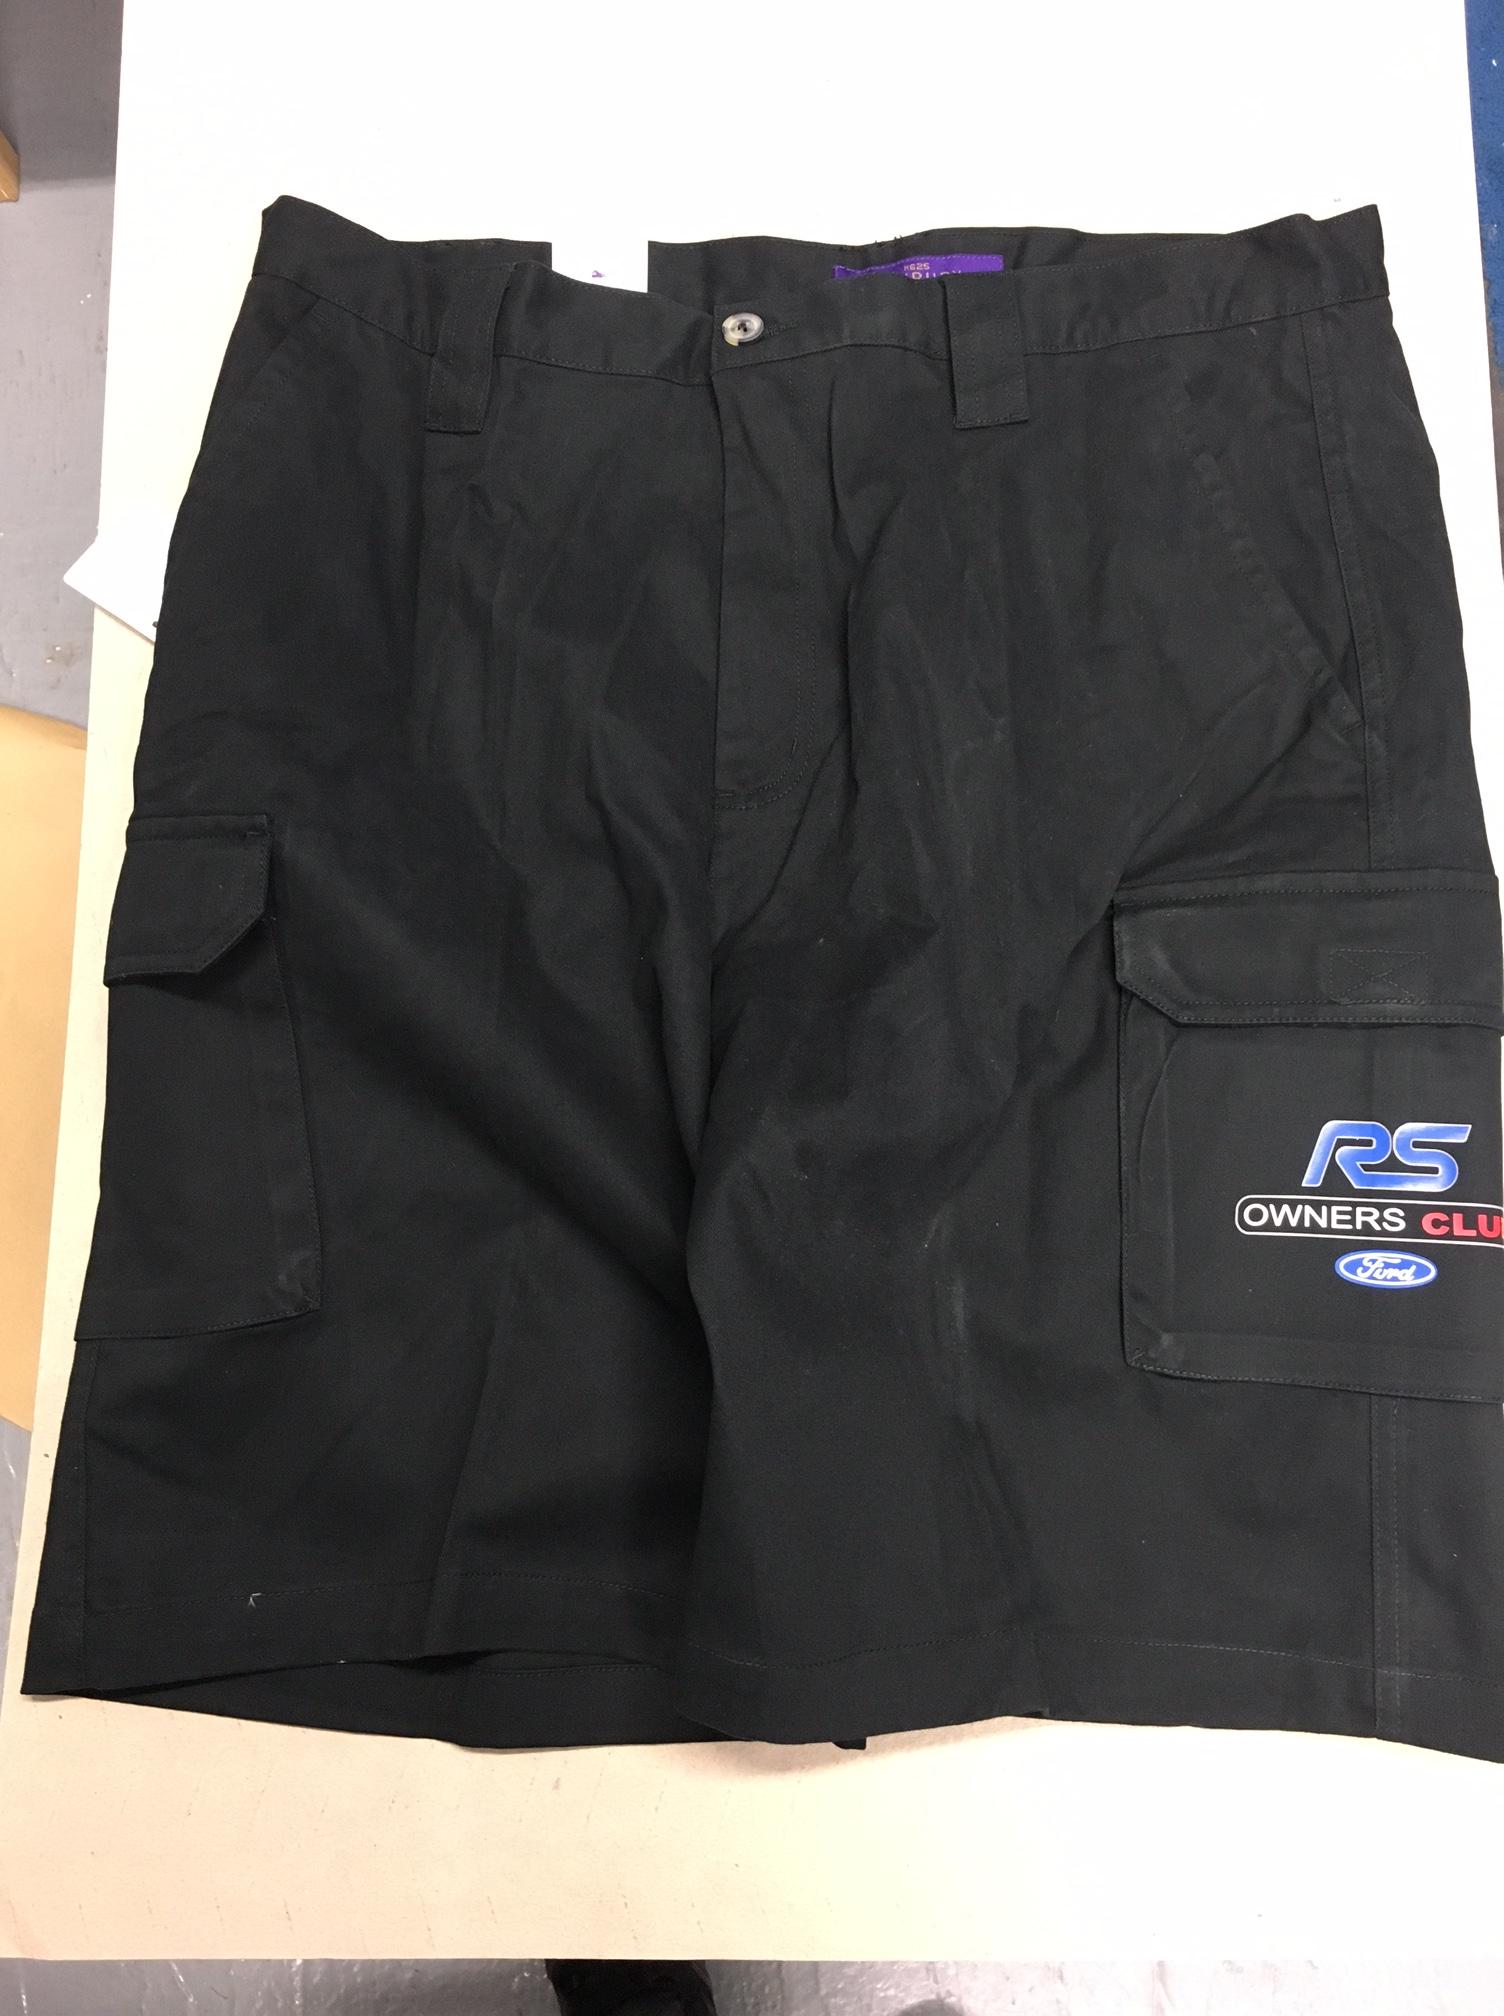 RSOC Cargo Shorts